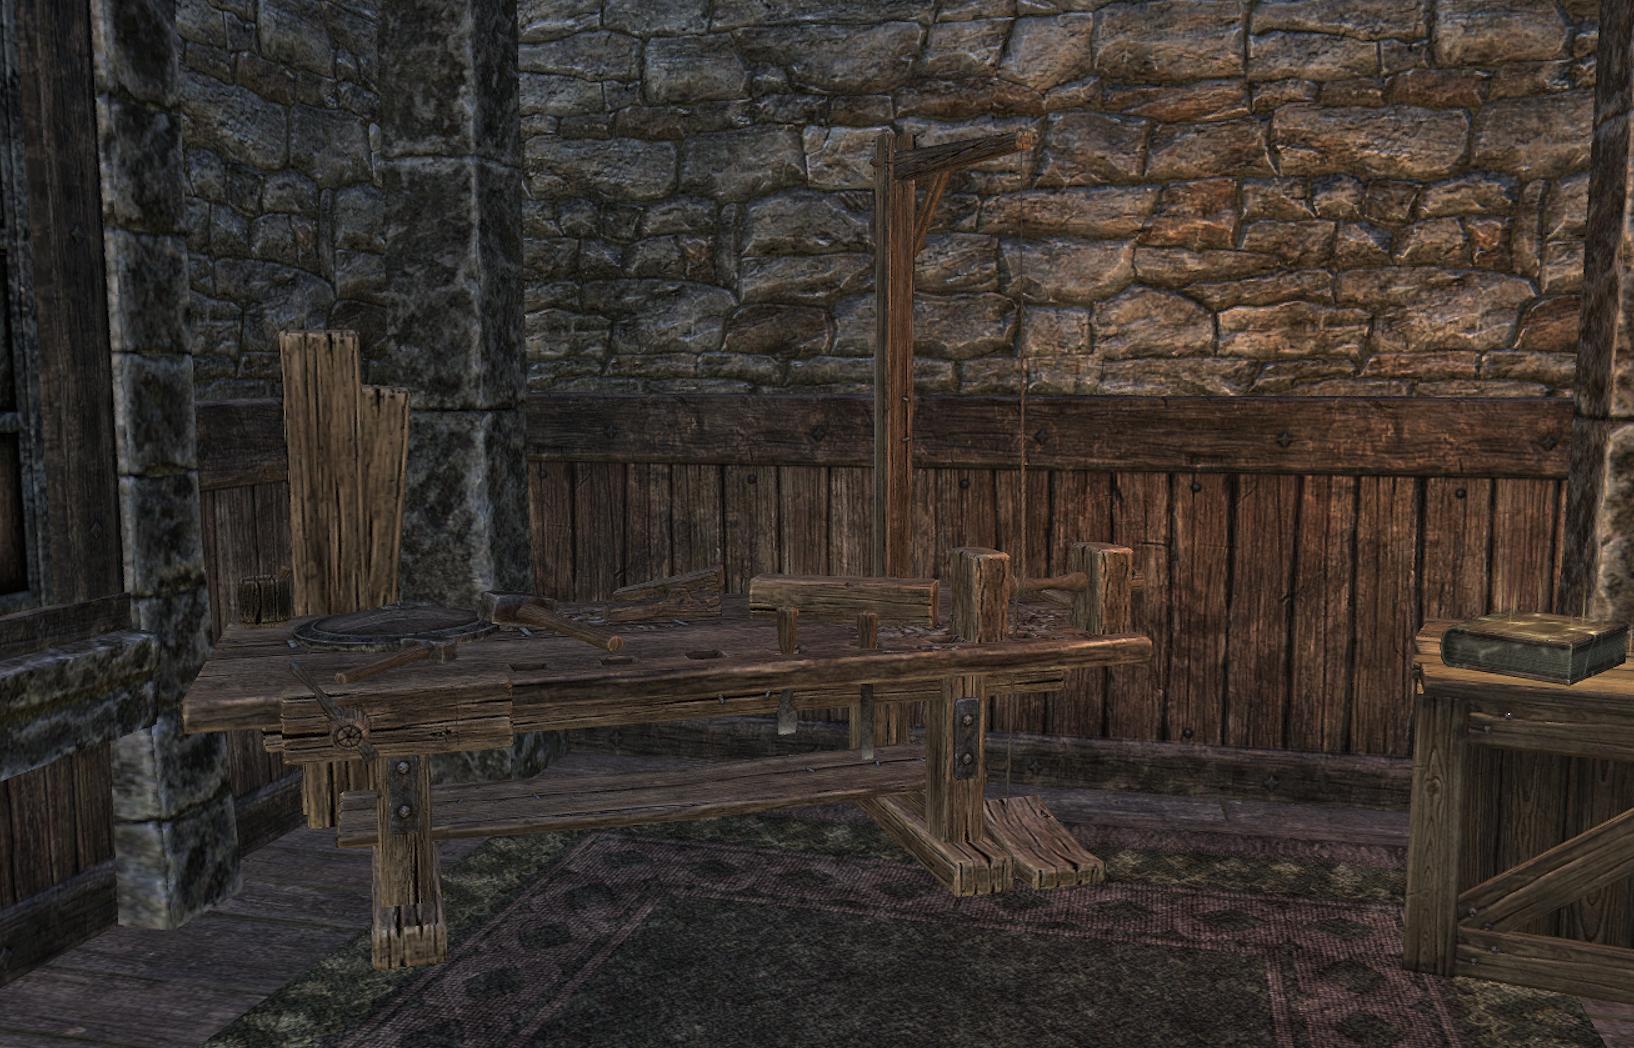 Woodworking Station | Elder Scrolls | FANDOM powered by Wikia